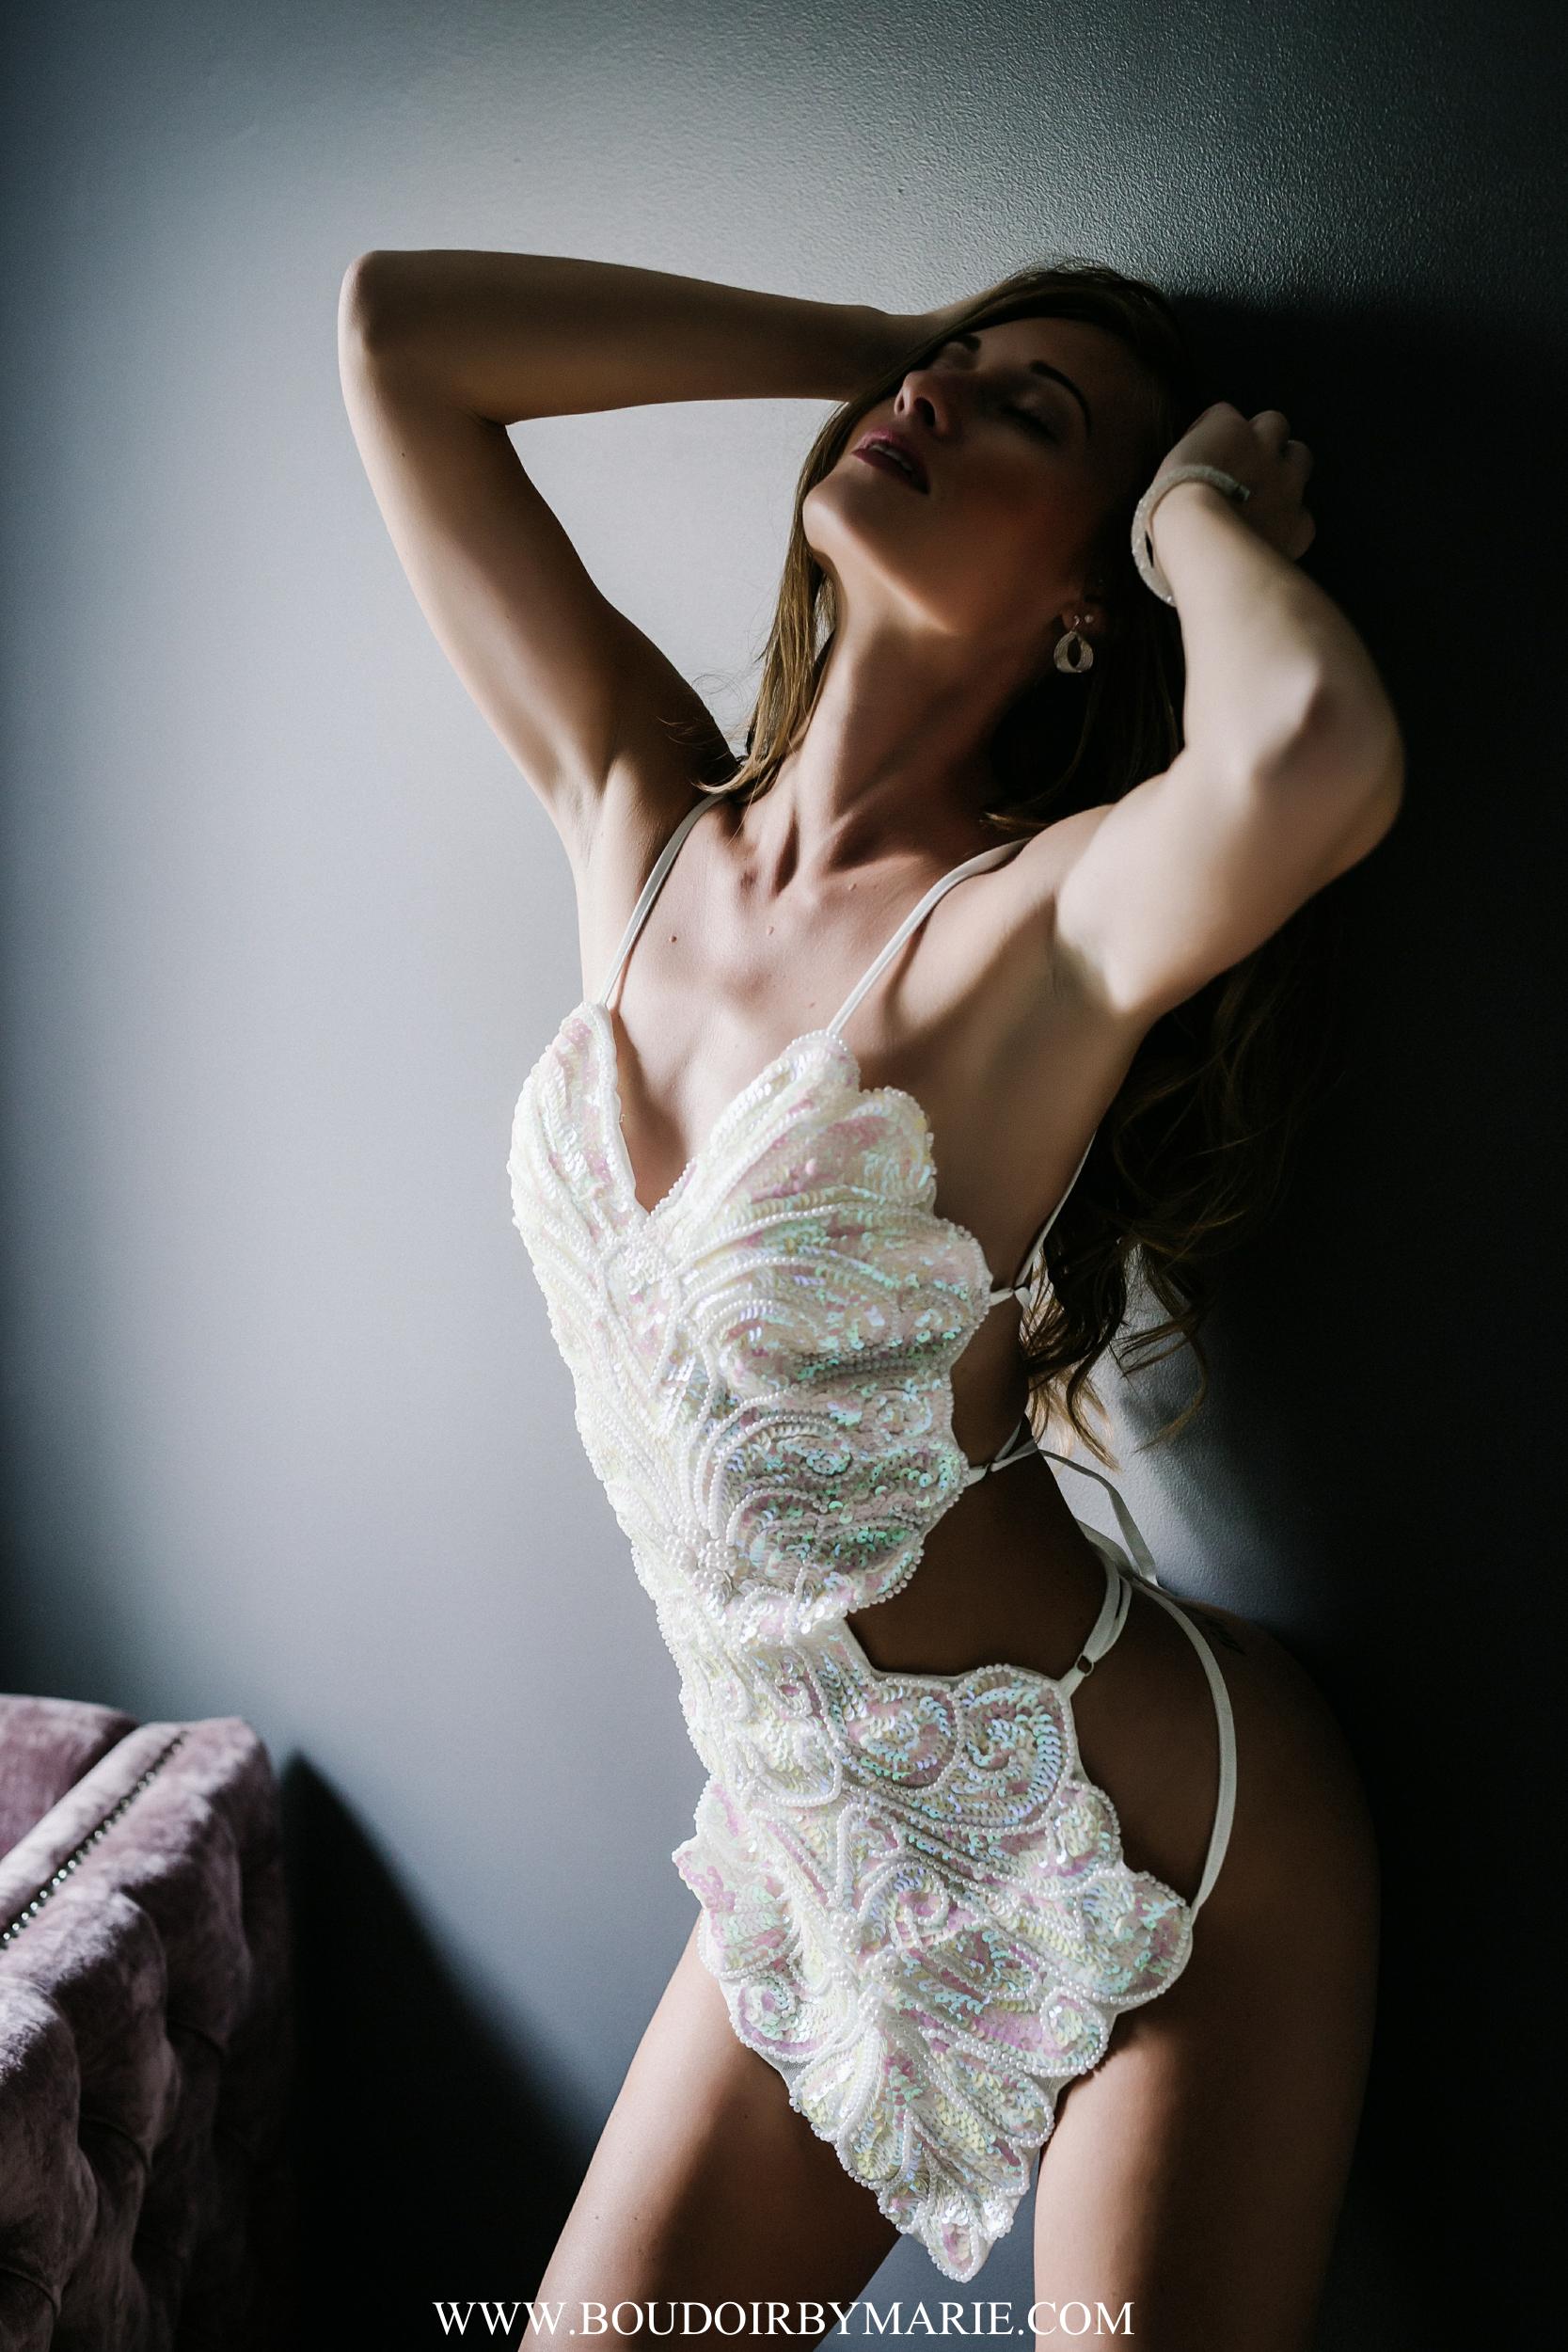 BoudoirbyMarie-Jackie-25.jpg